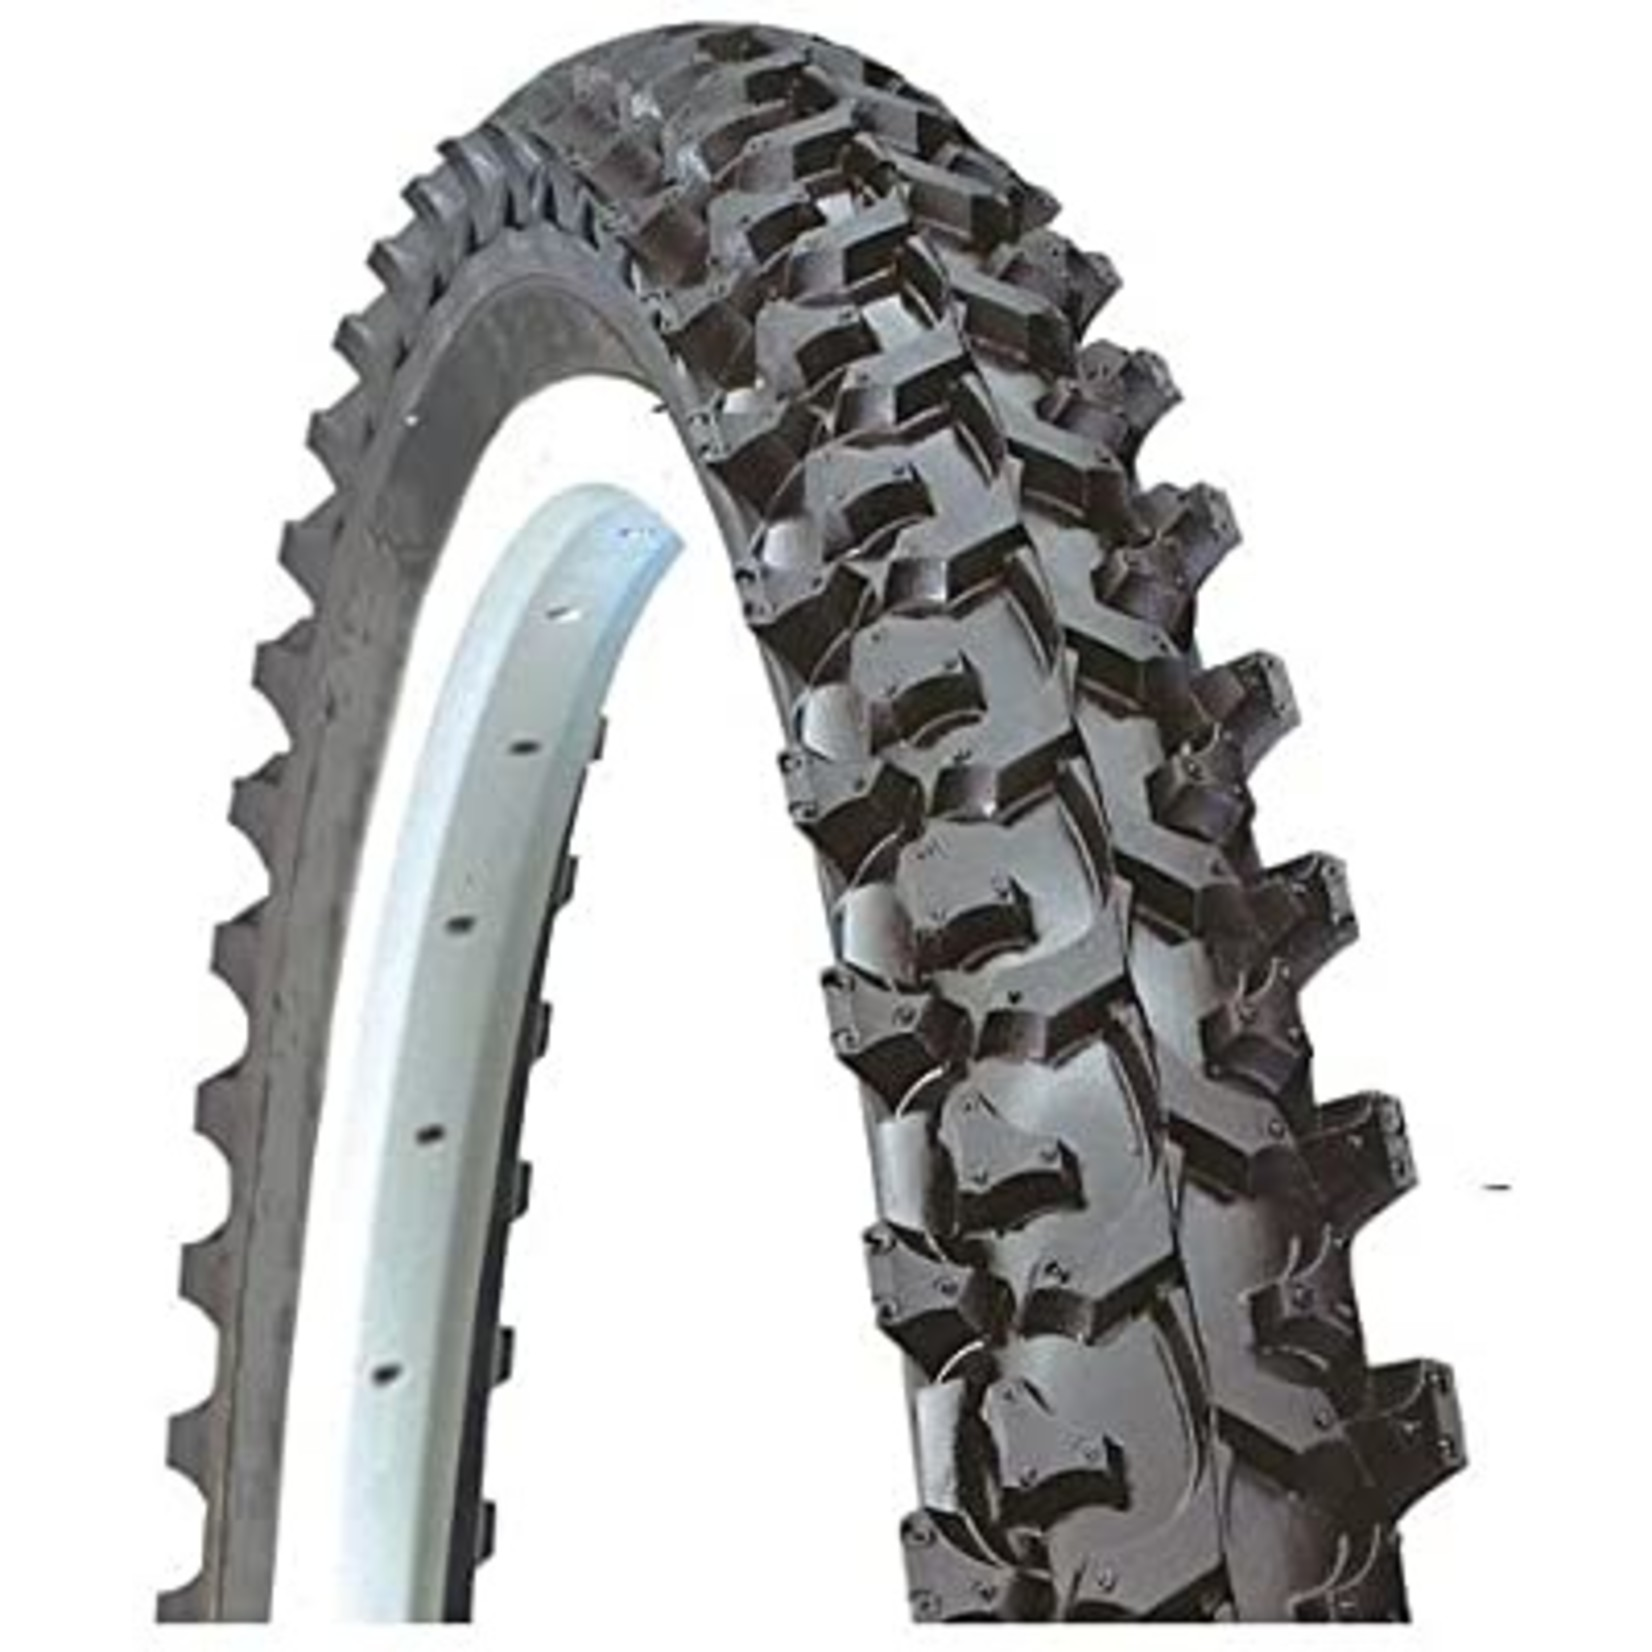 Kenda K850 26x1.95 Wire Bead Tire